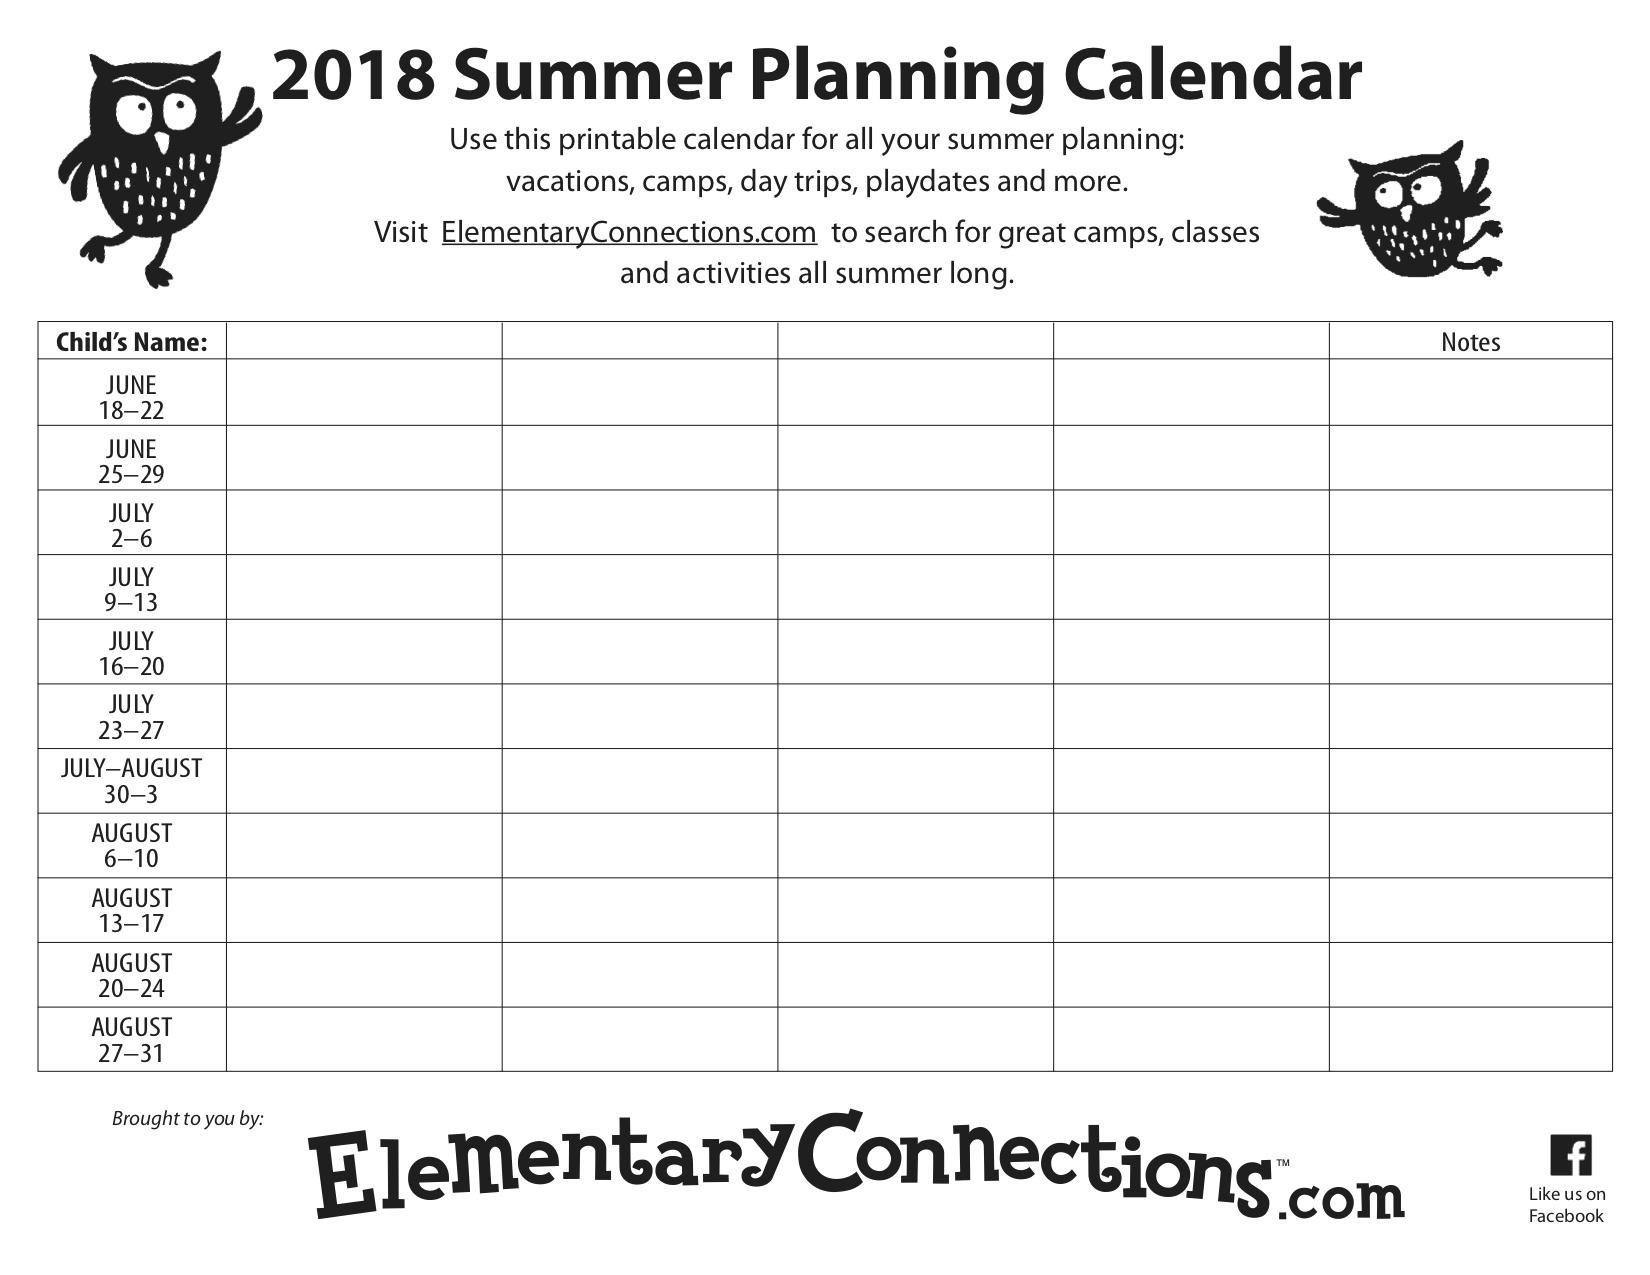 EC_SummerPlanning2018_Web.png